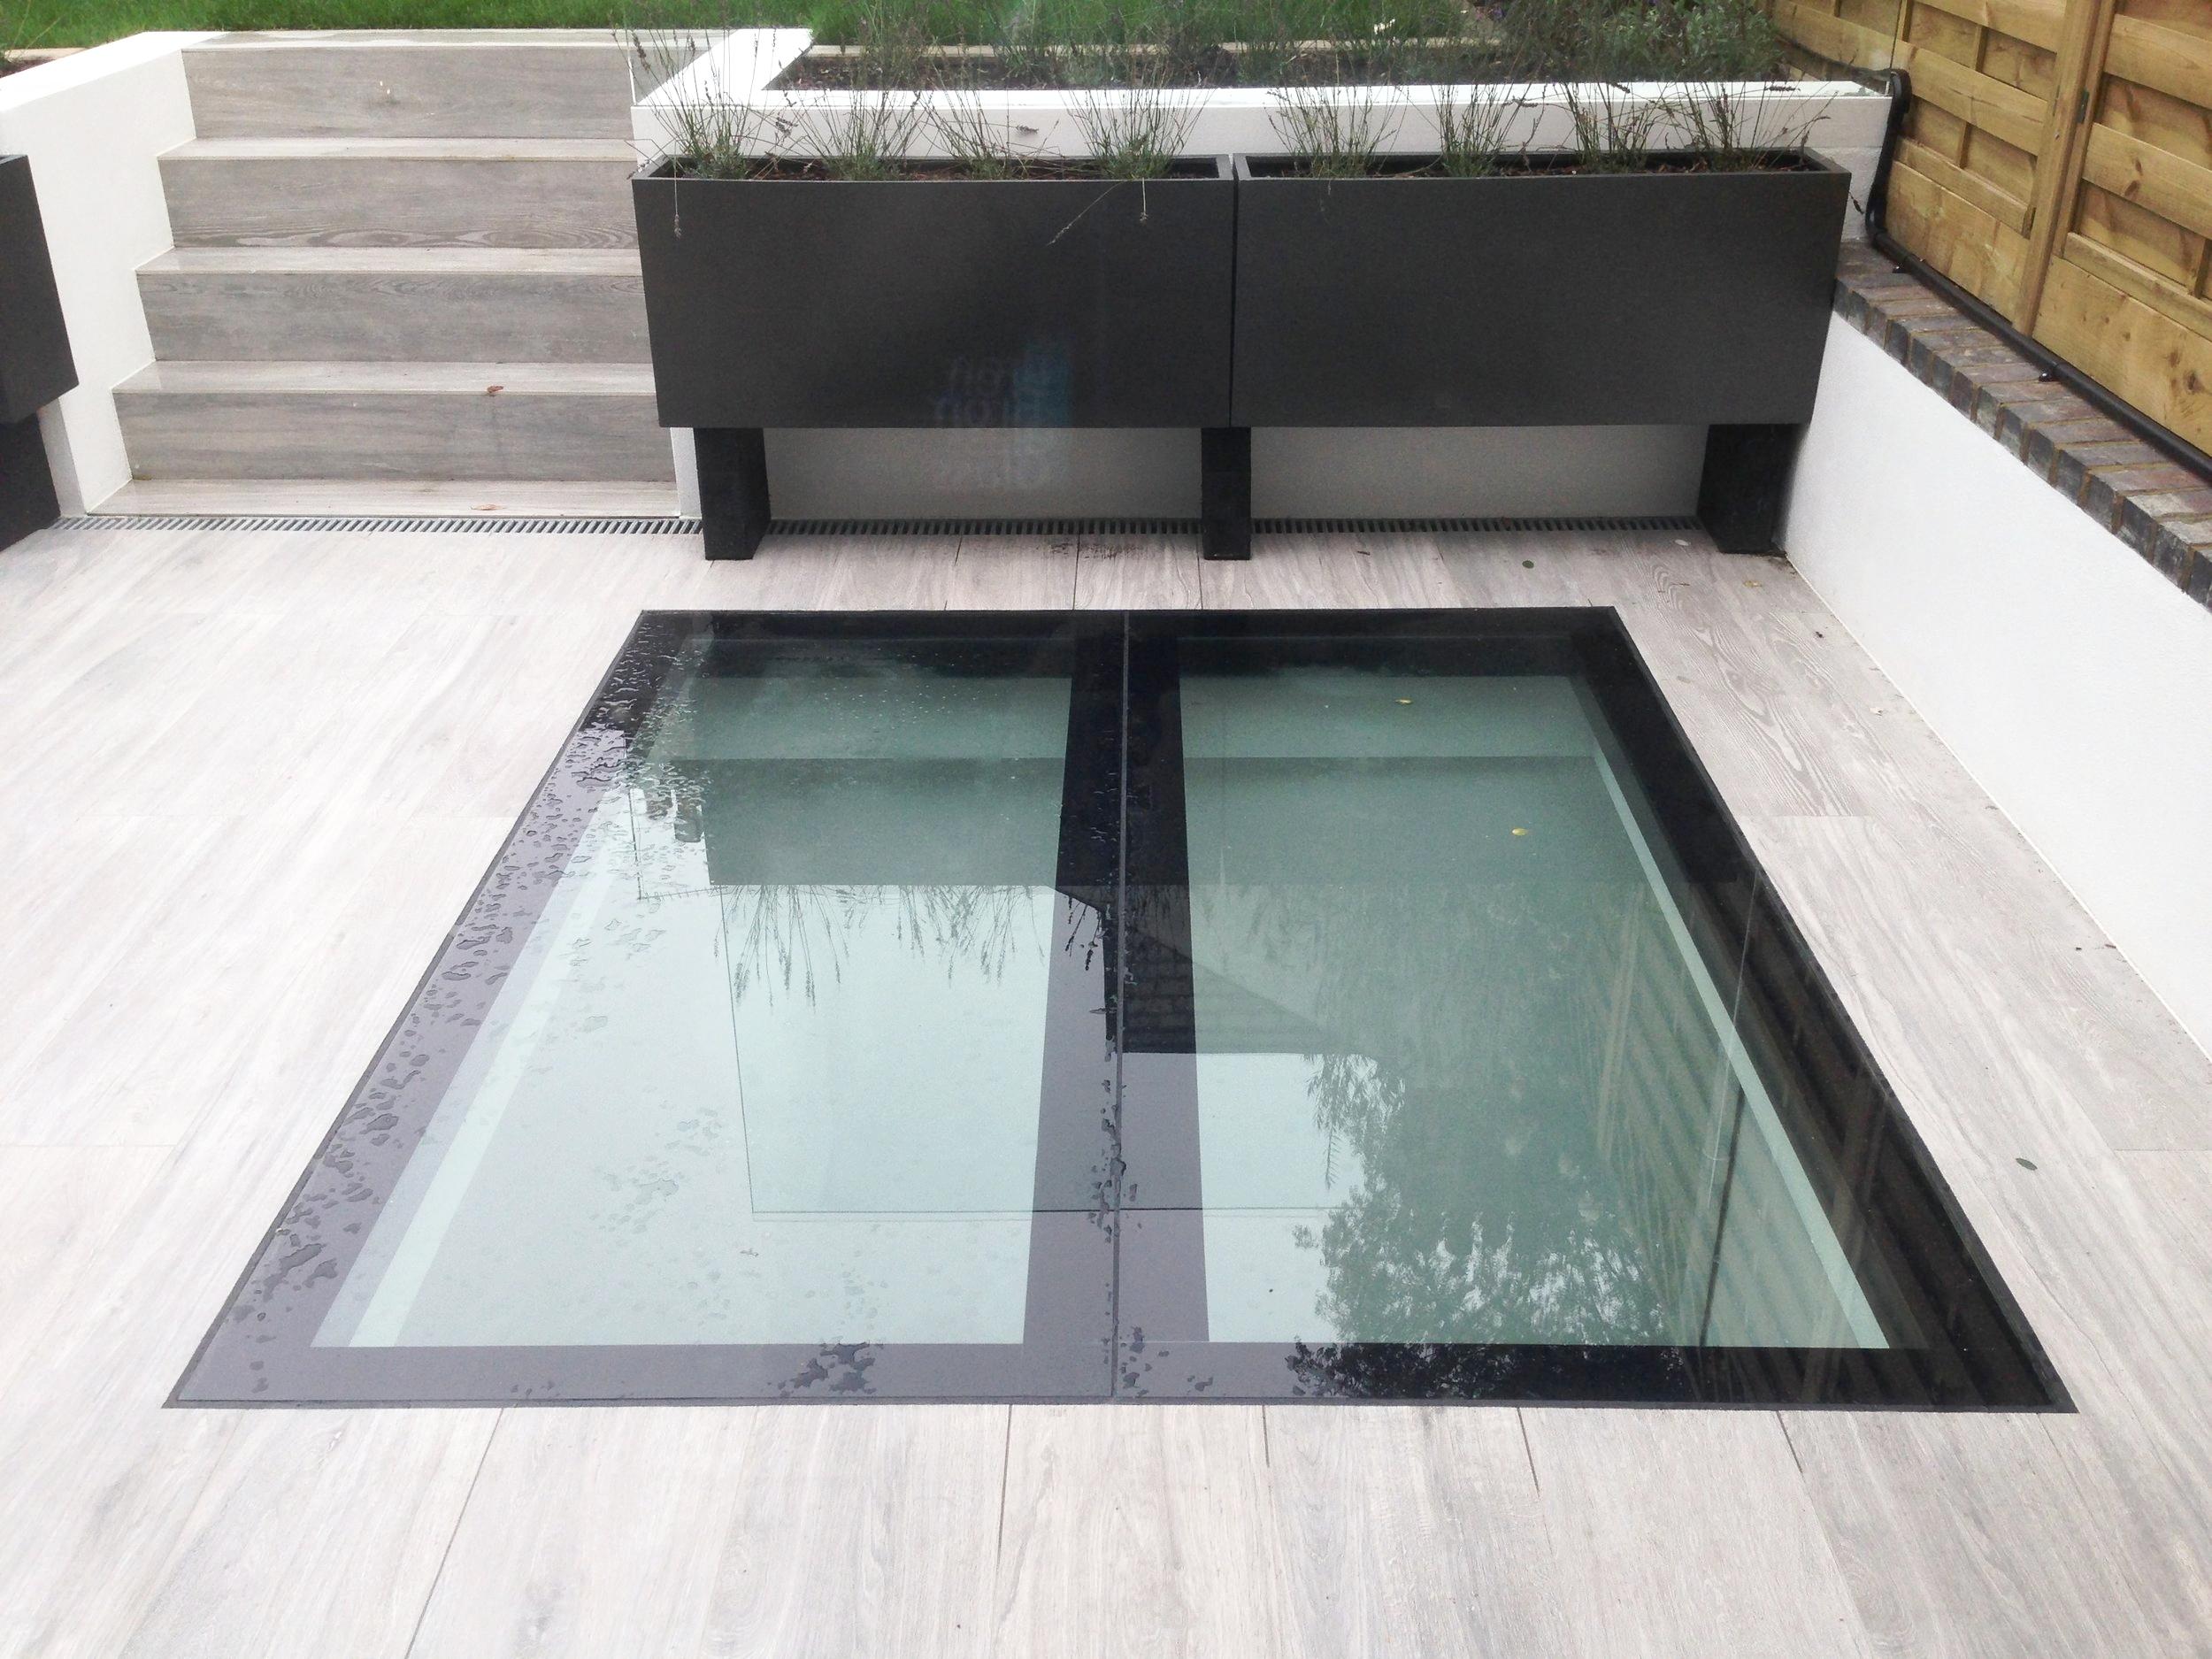 Glass Floor - SW5 - London - Brompton Glass 3.JPG